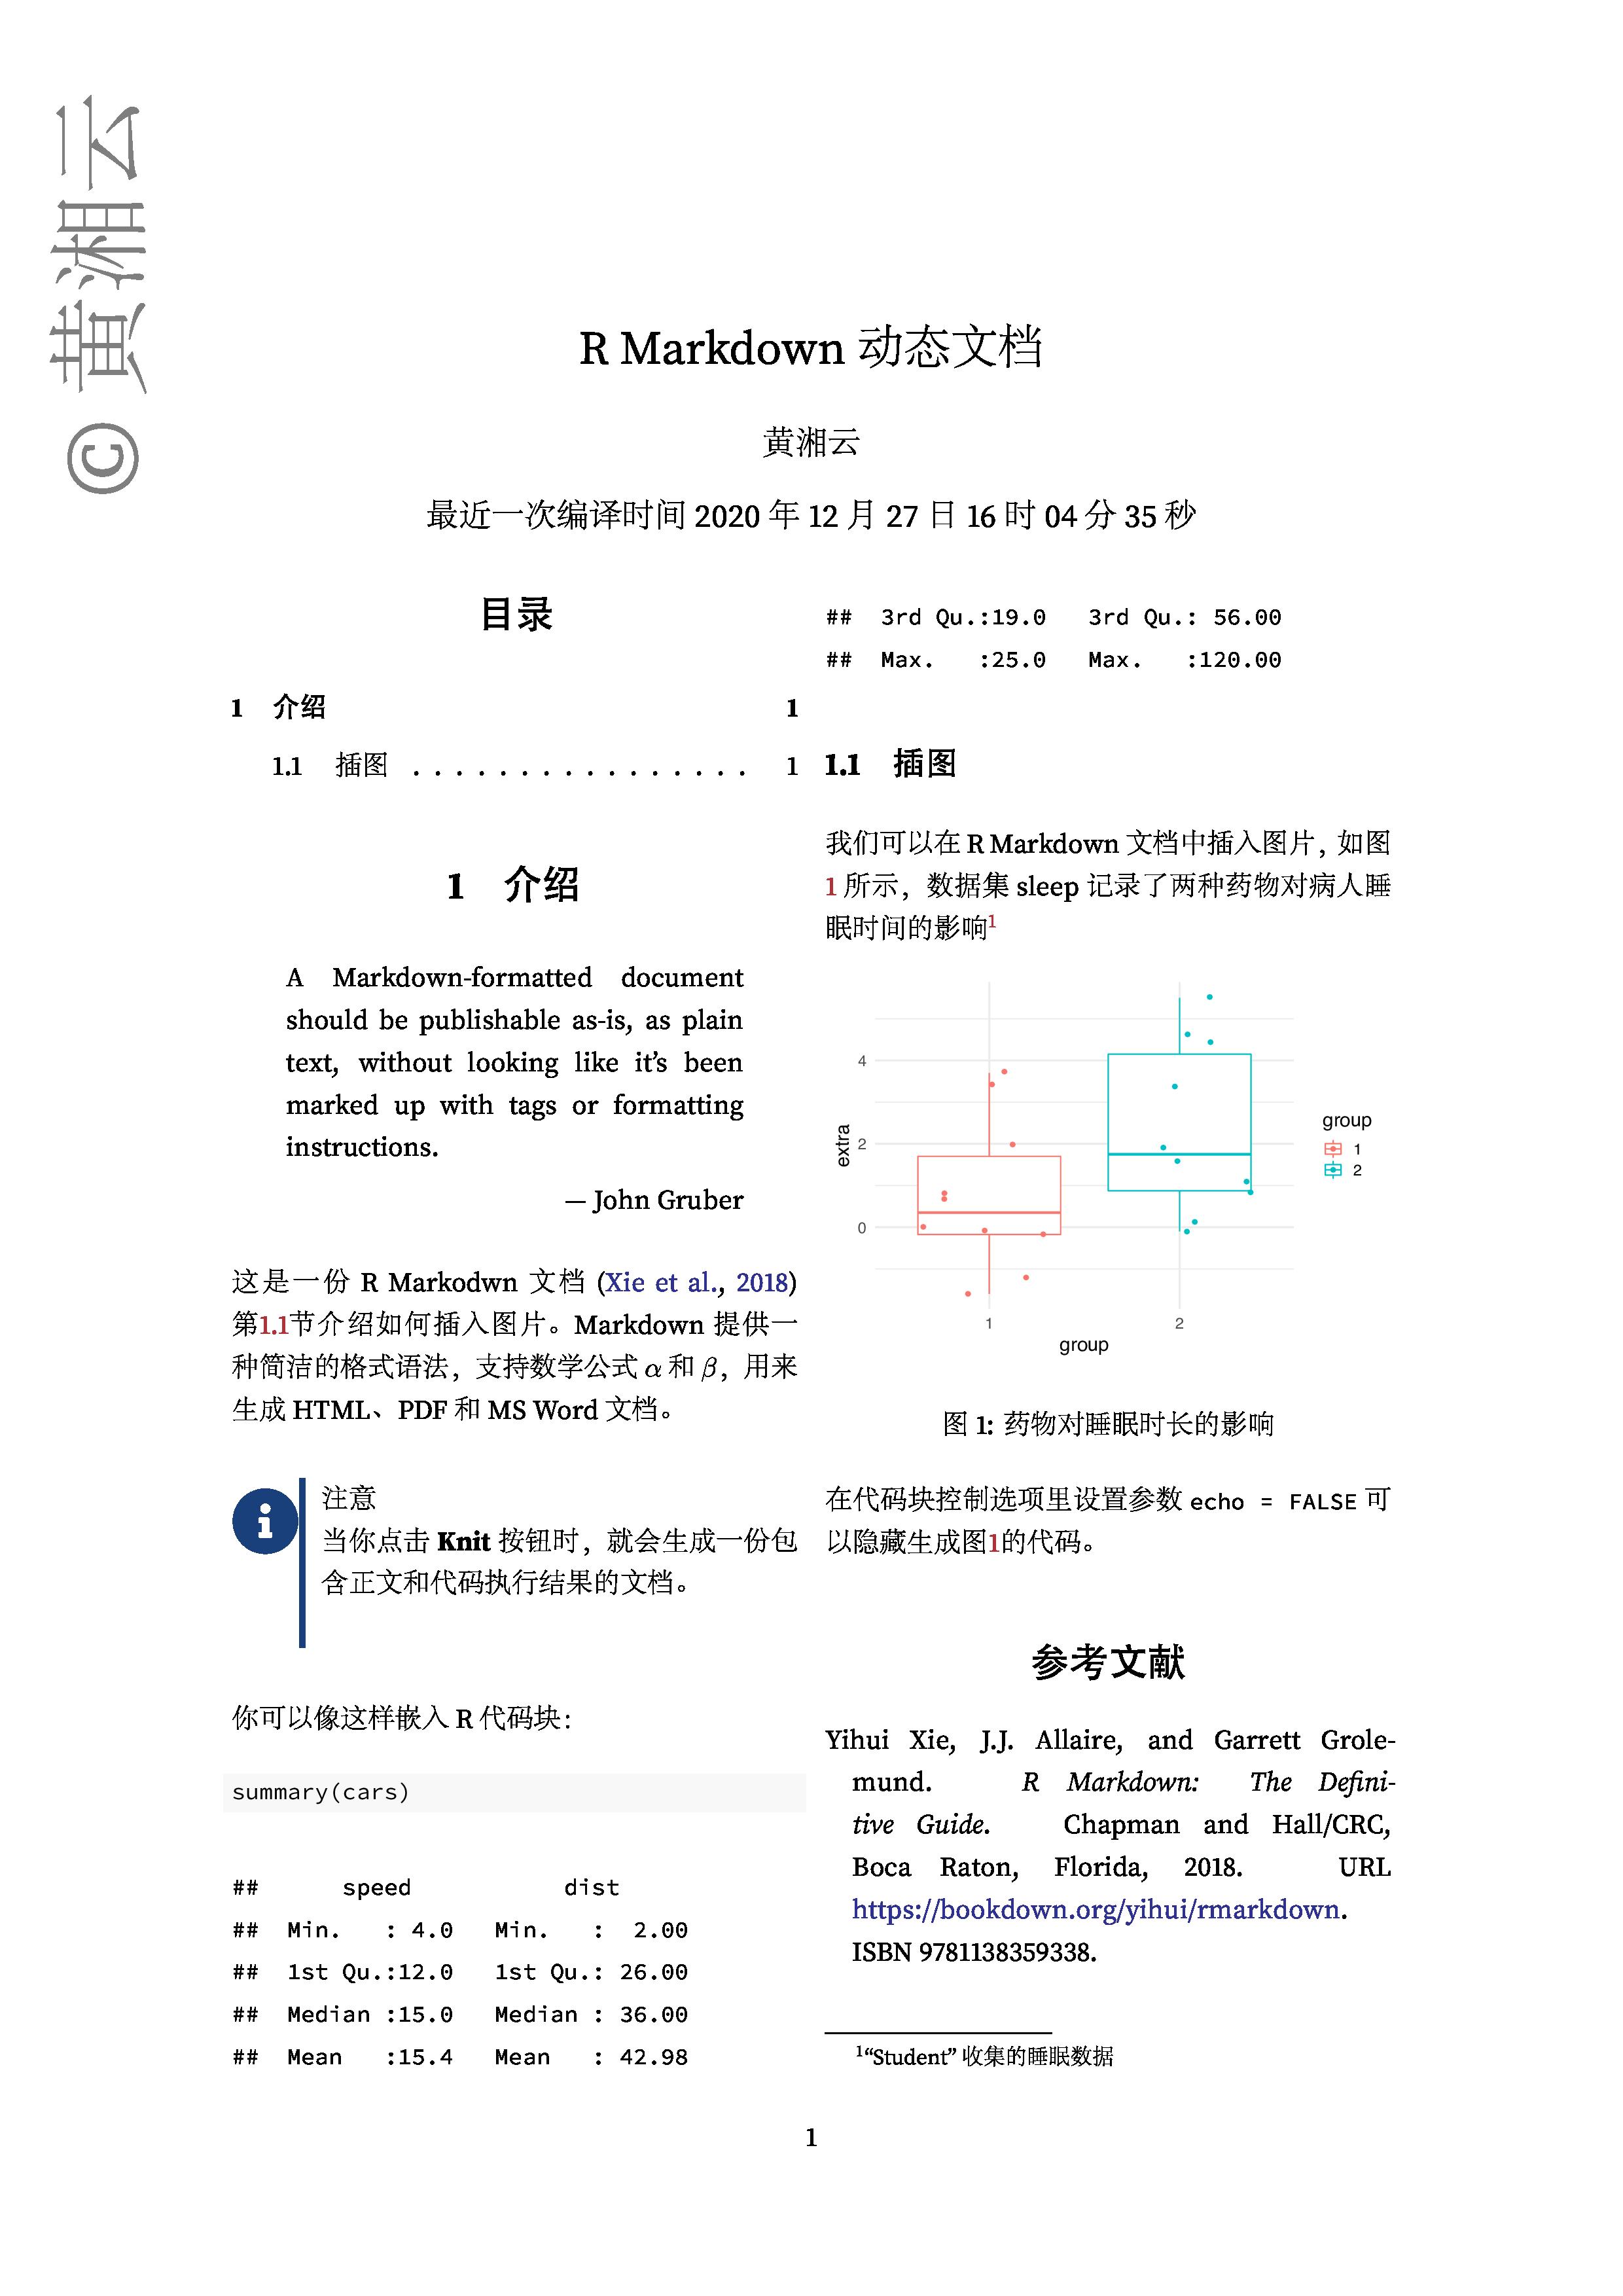 pdf-documents